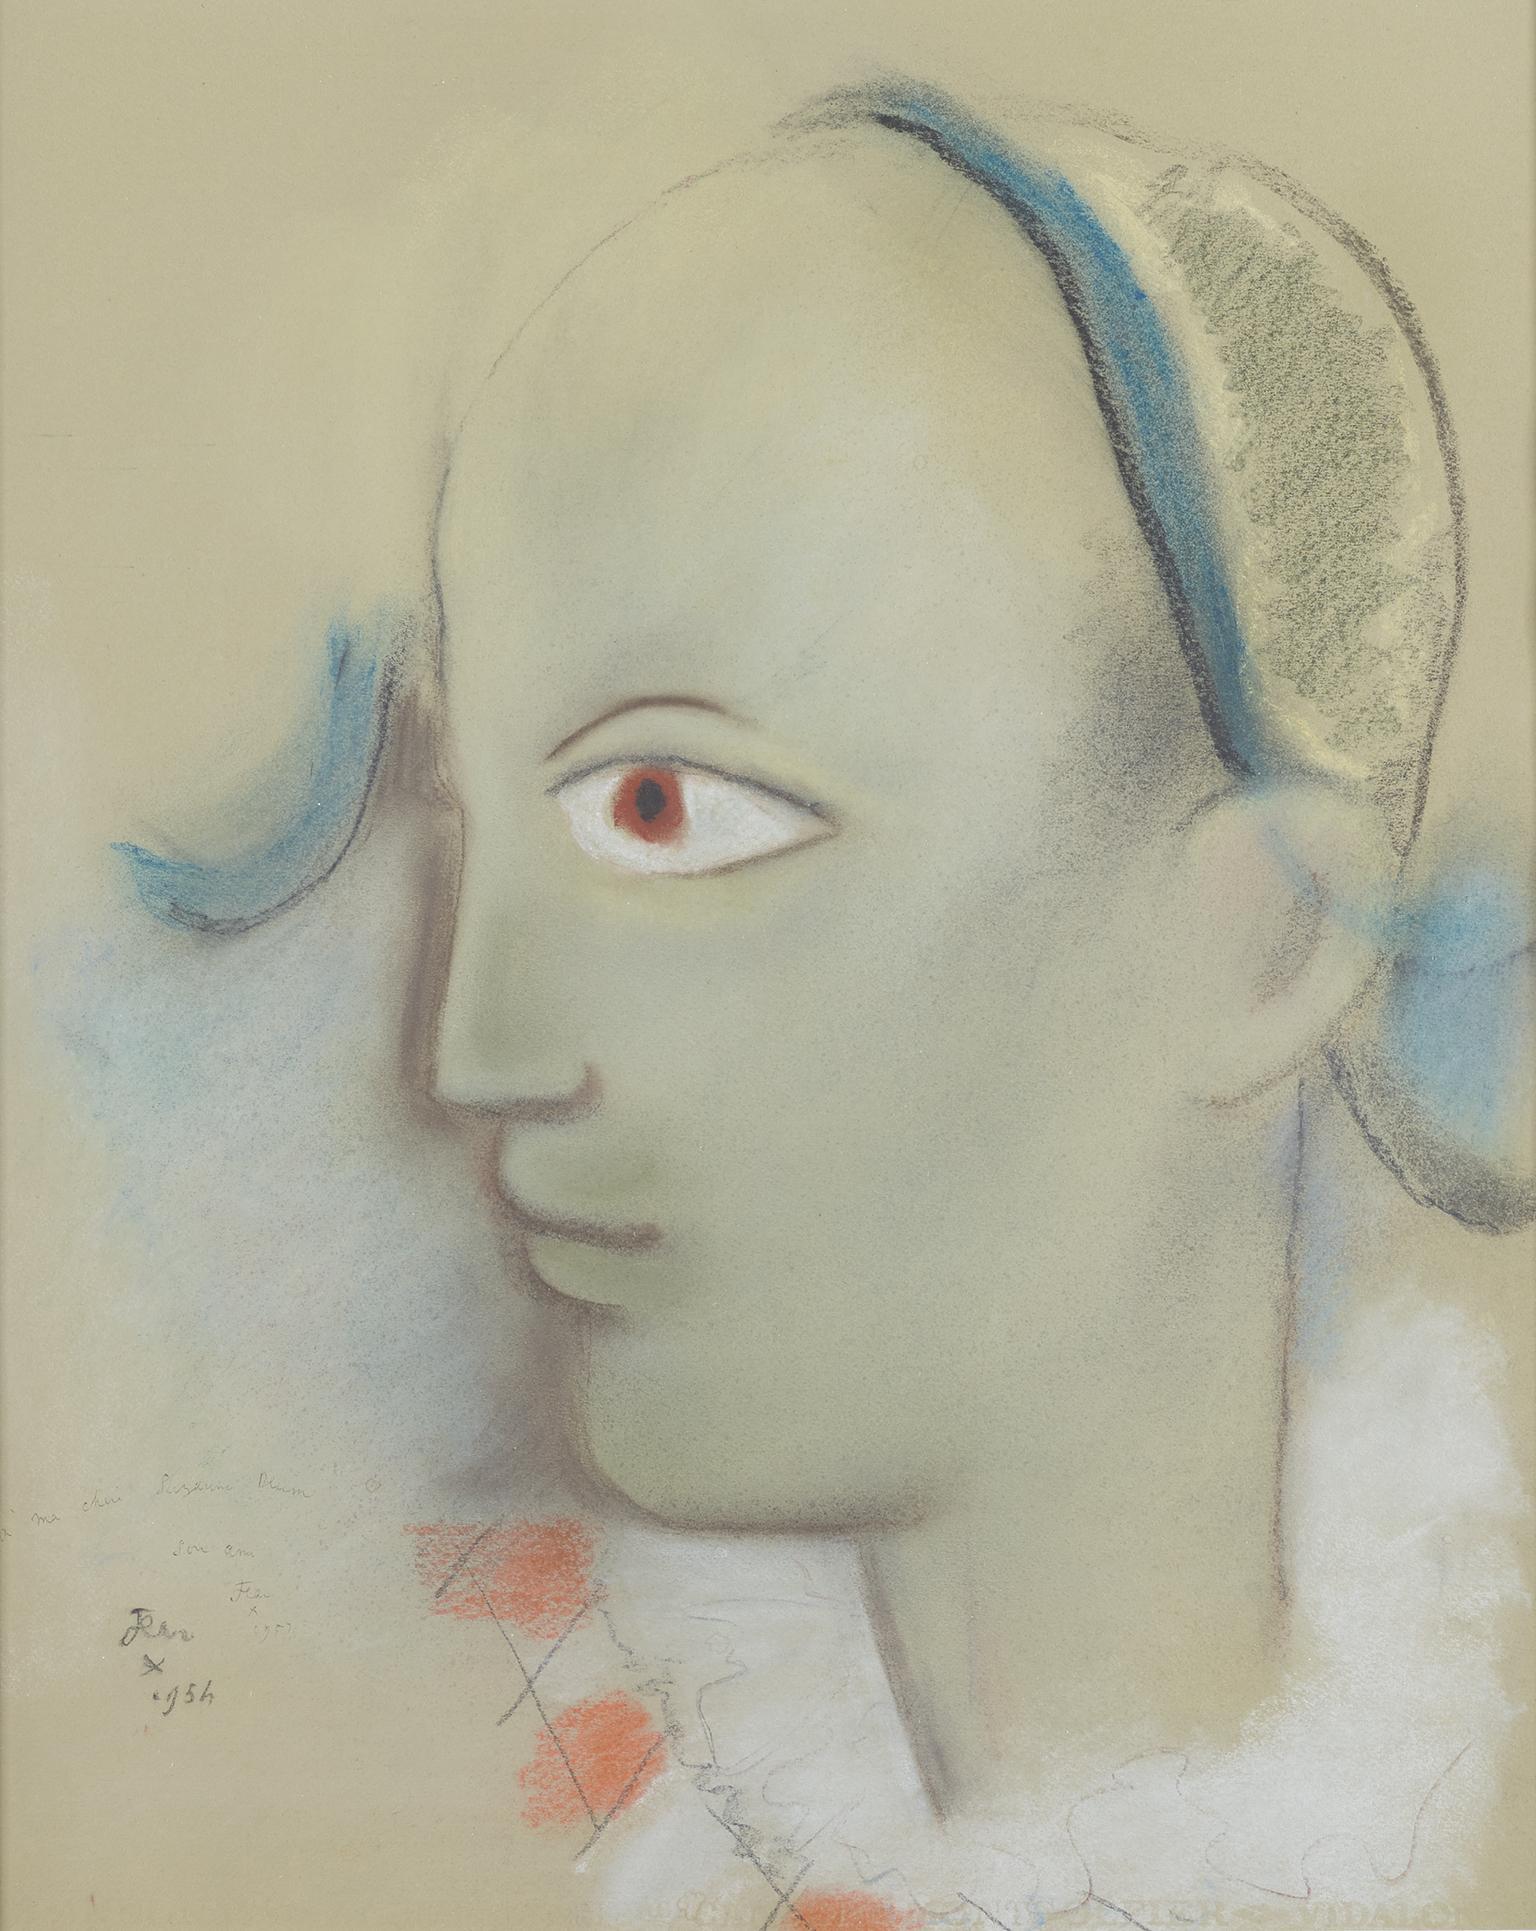 L'Arlequin à l'oeil Orange, Pastel on Paper